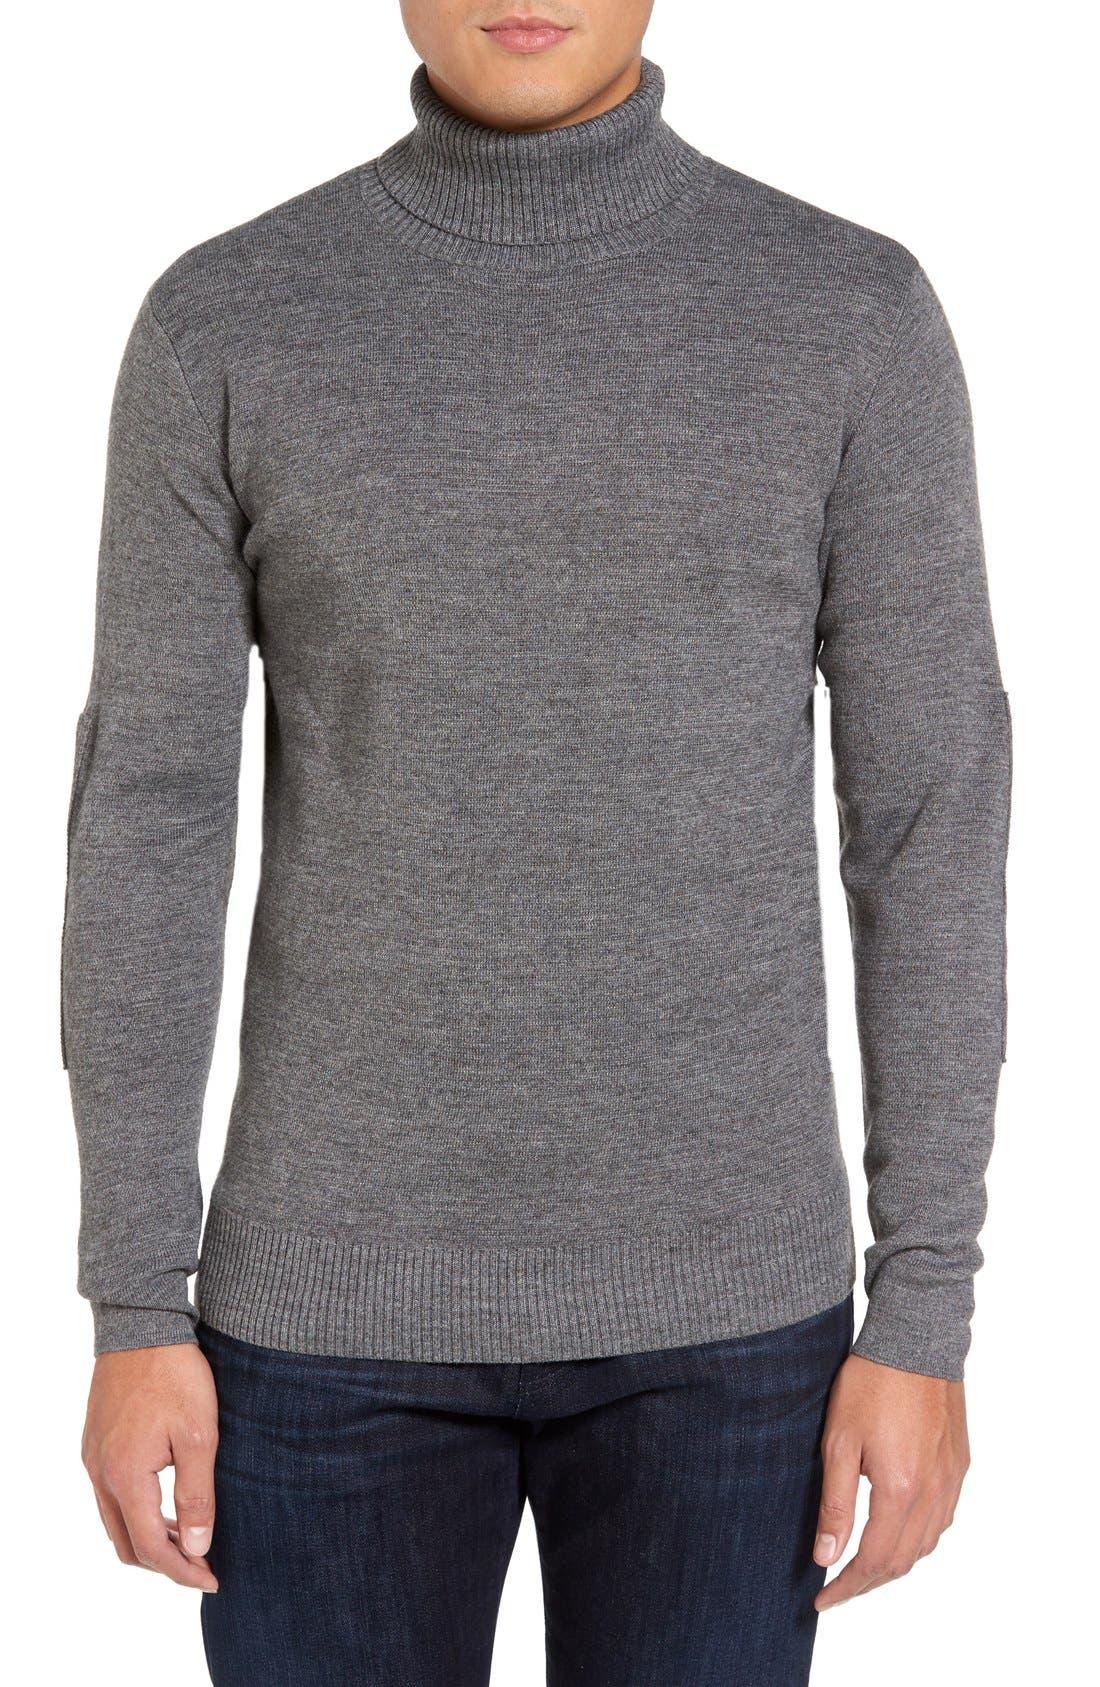 Merino Wool Blend Turtleneck Sweater,                             Main thumbnail 1, color,                             020